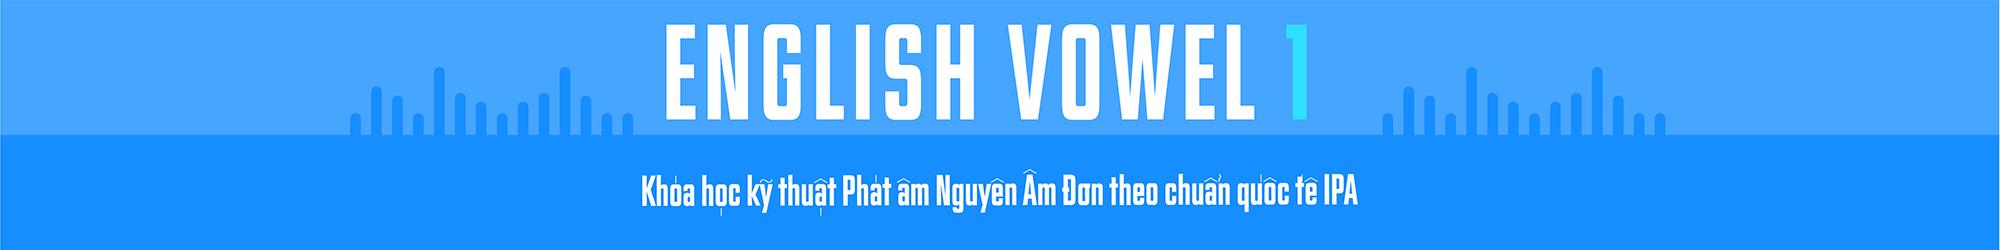 English Pronunciation IPA (Vowels 1) banner